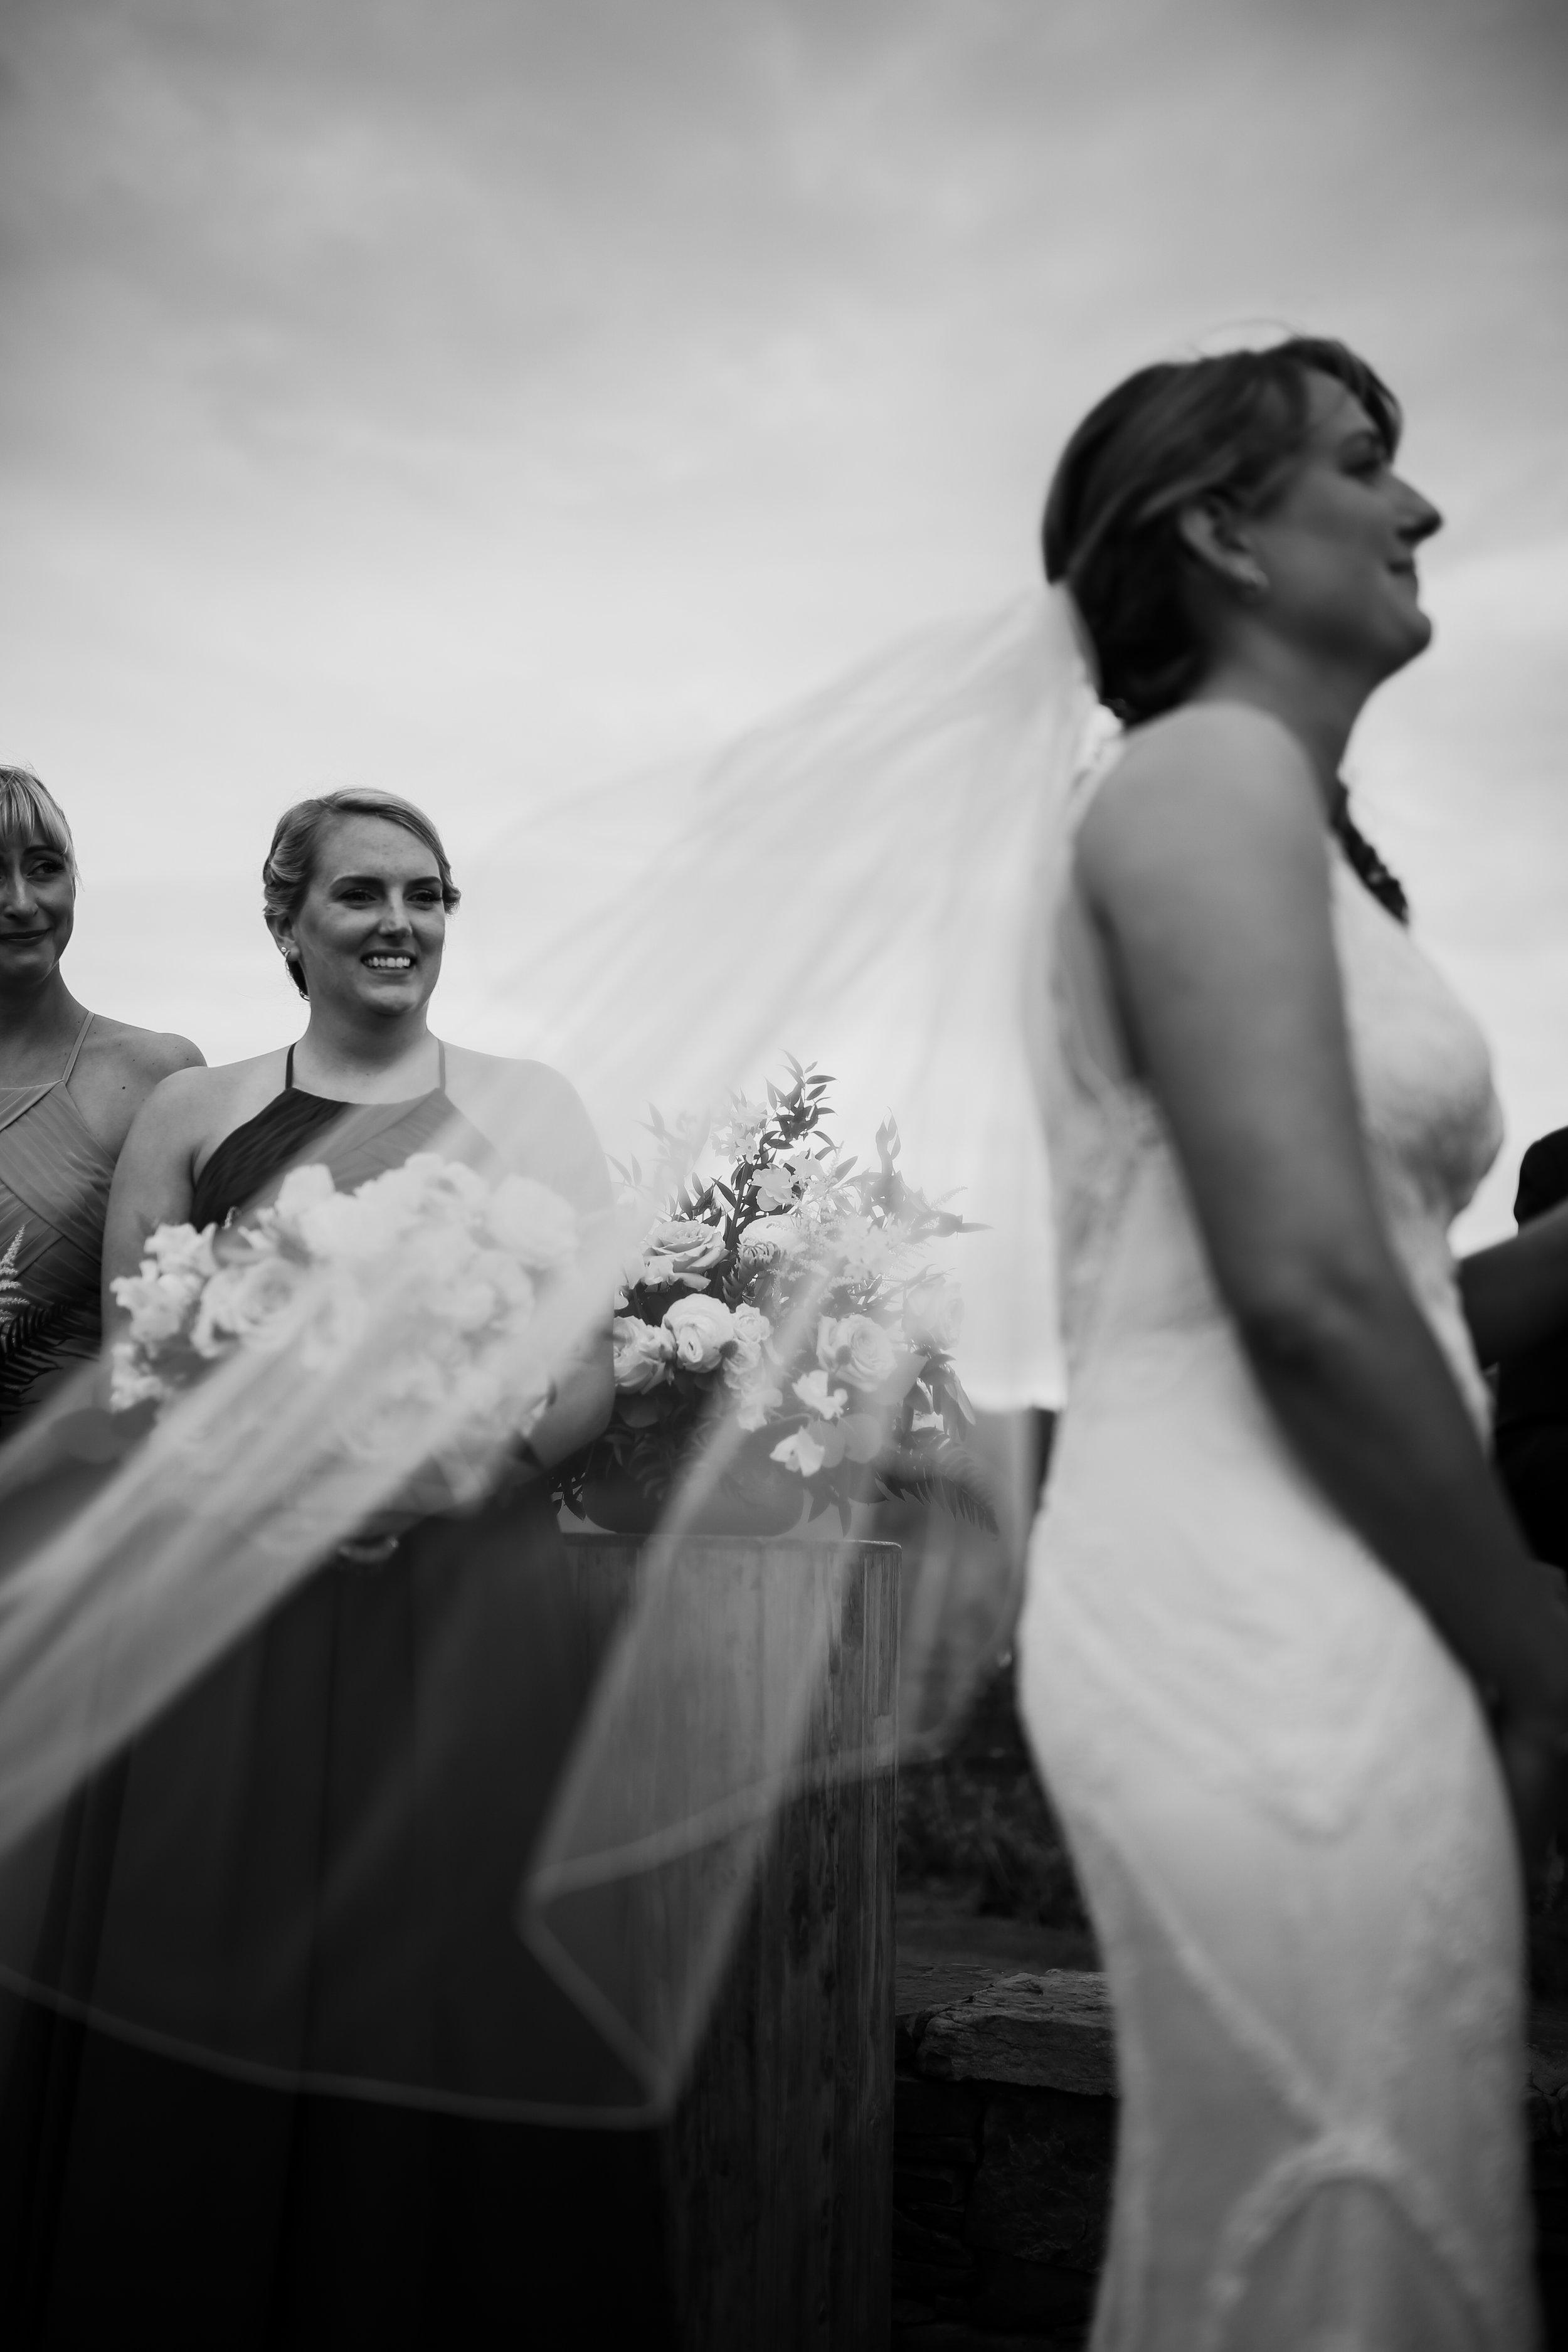 TheGreens_Married_2019-333.jpg